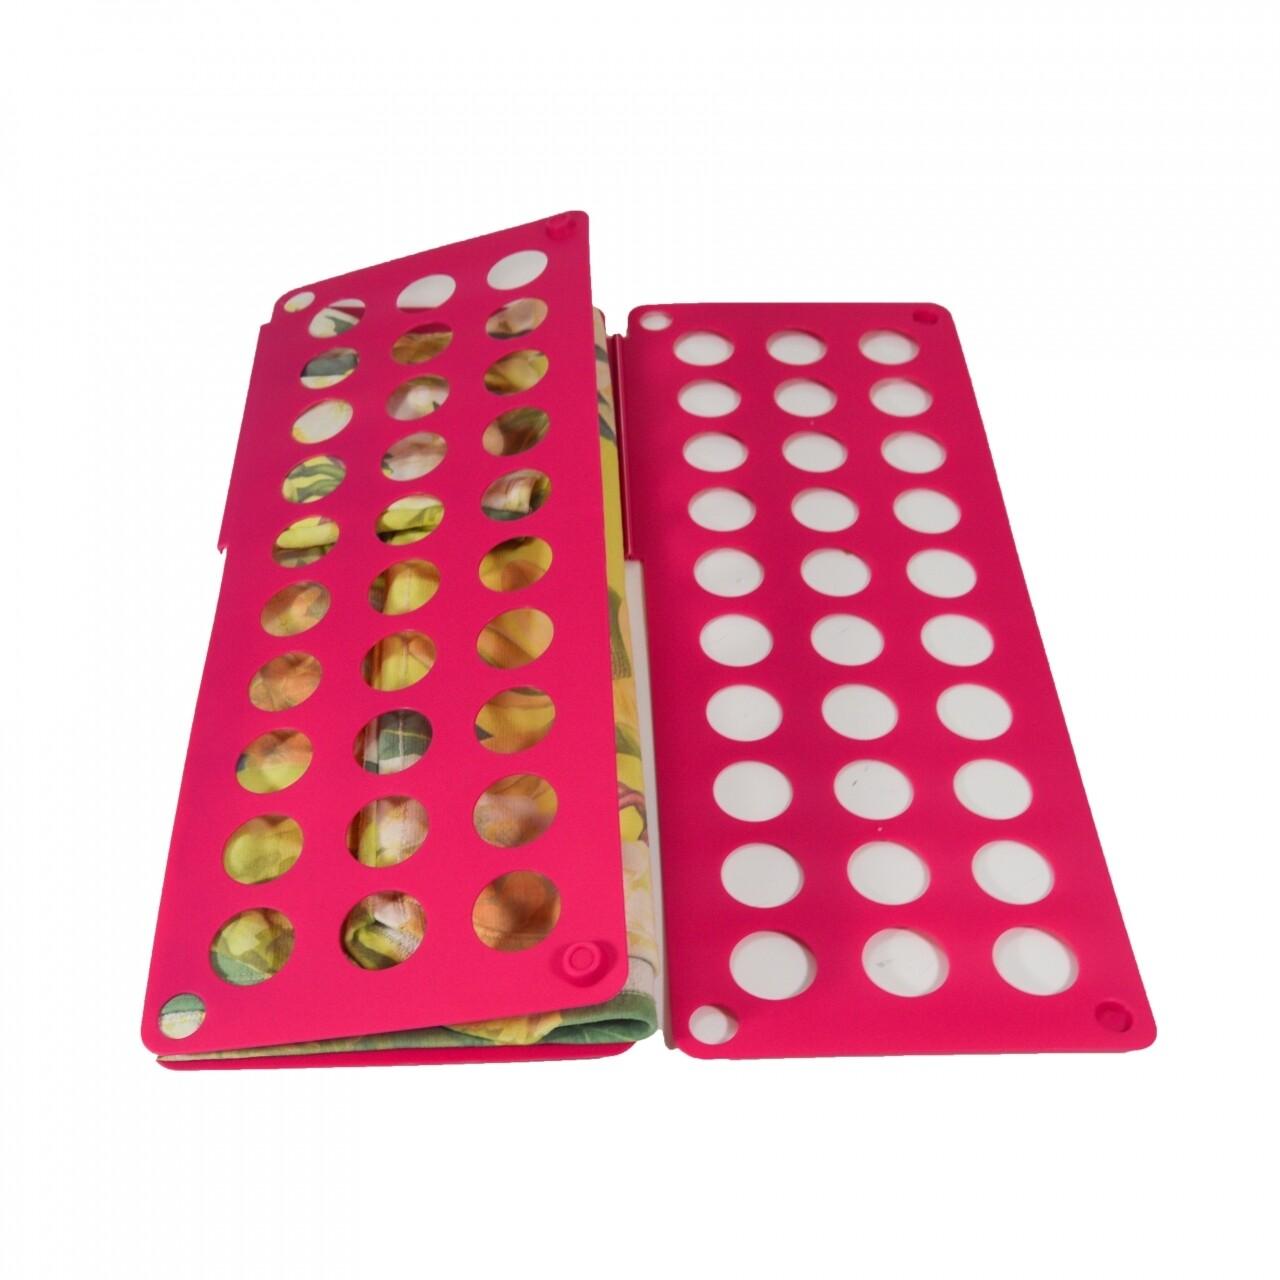 Plansa pentru impaturit haine Pinky, Jocca, 60 x 70 cm, polipropilena, rosu